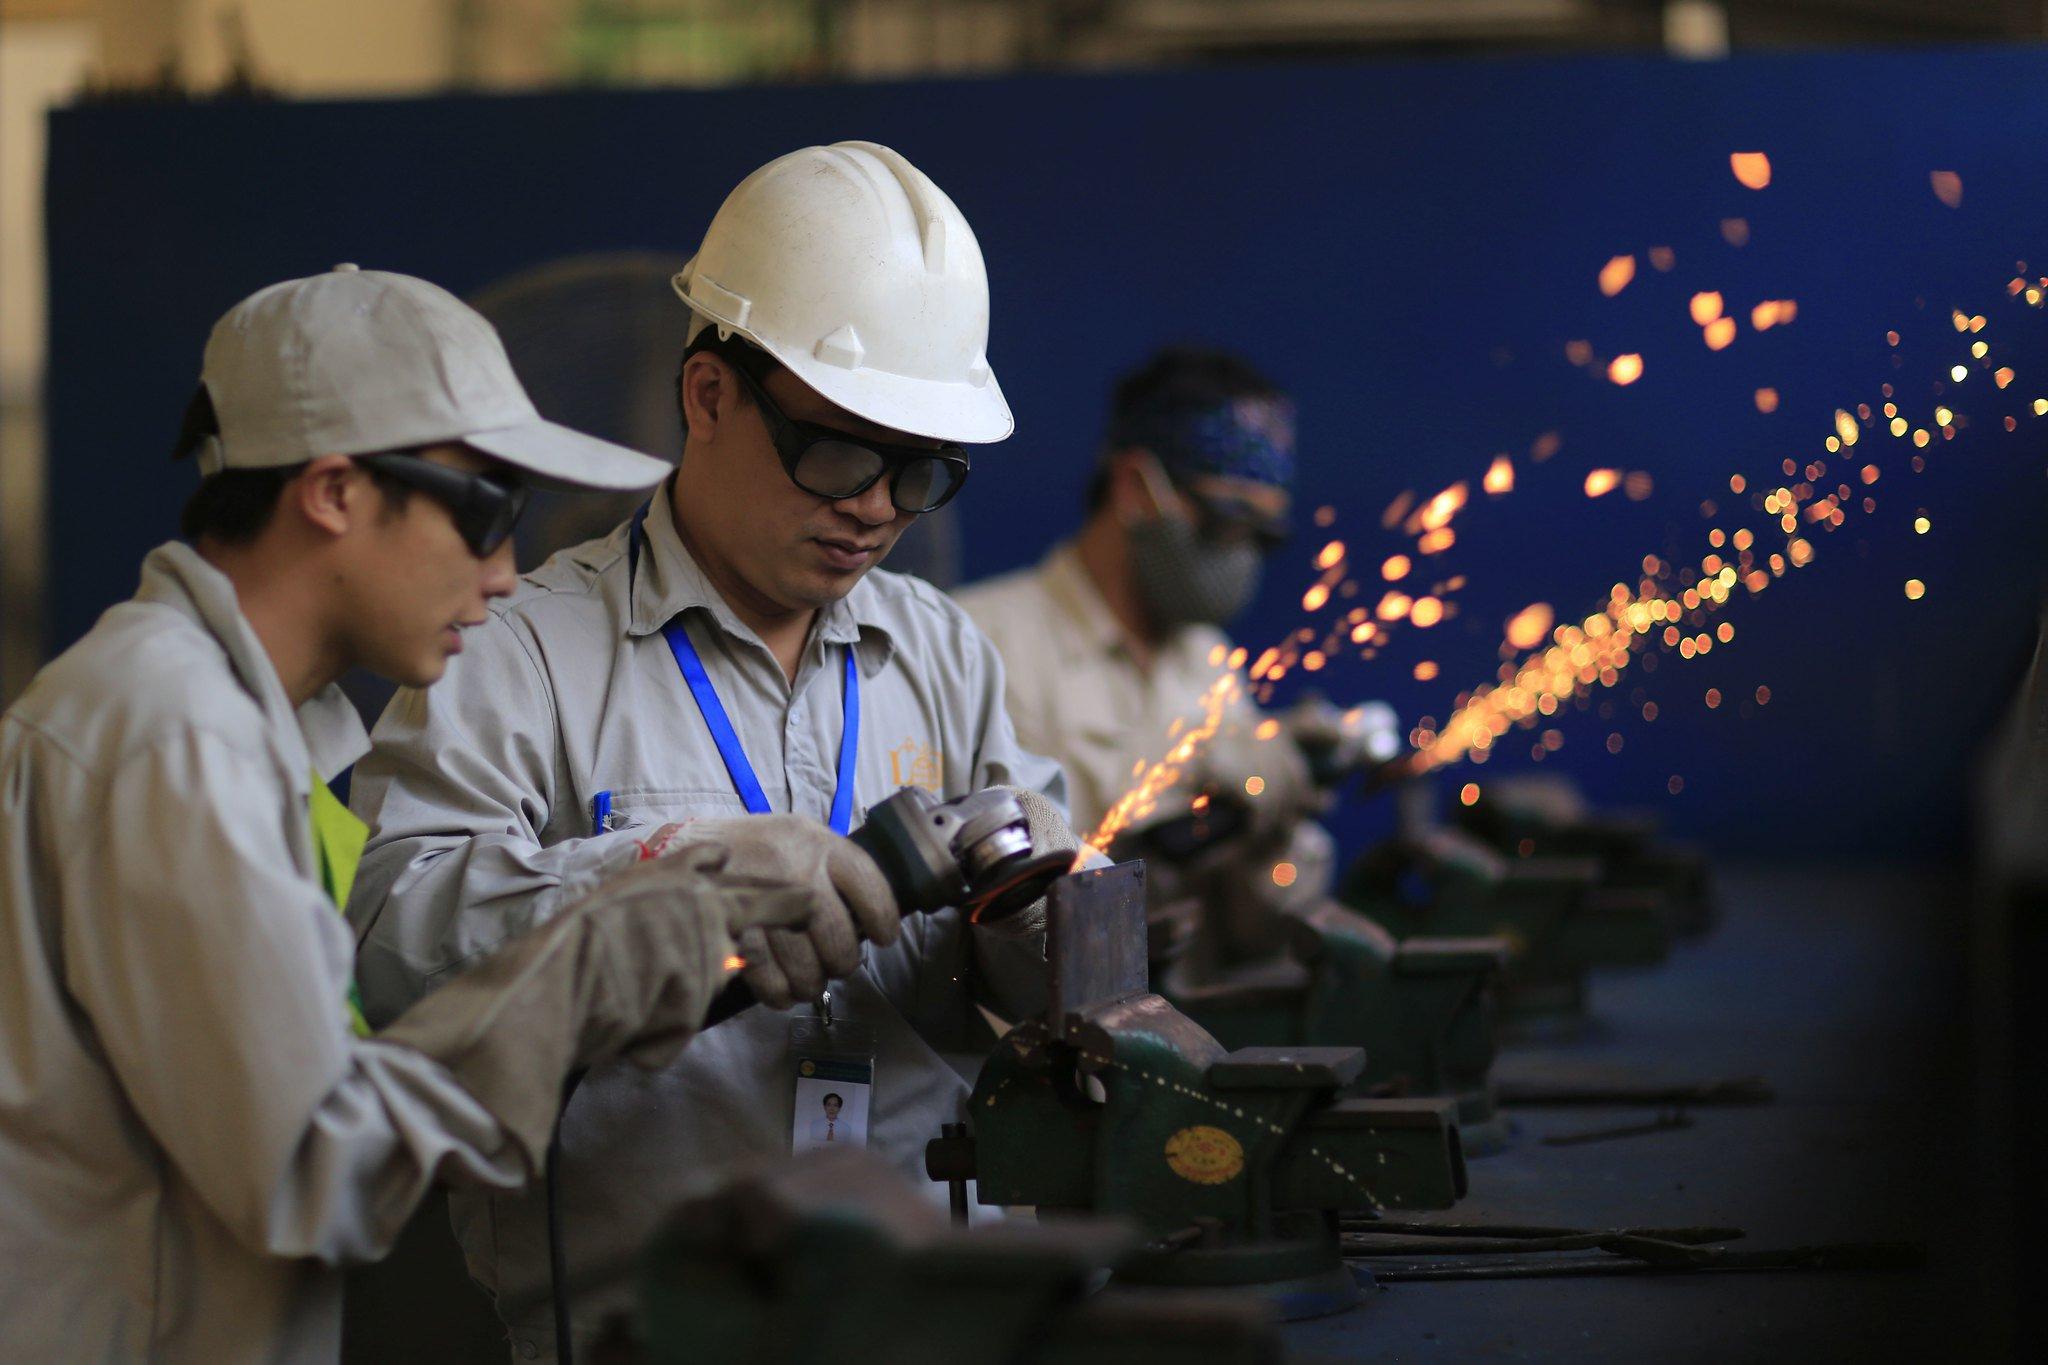 Migrant workers in Japan